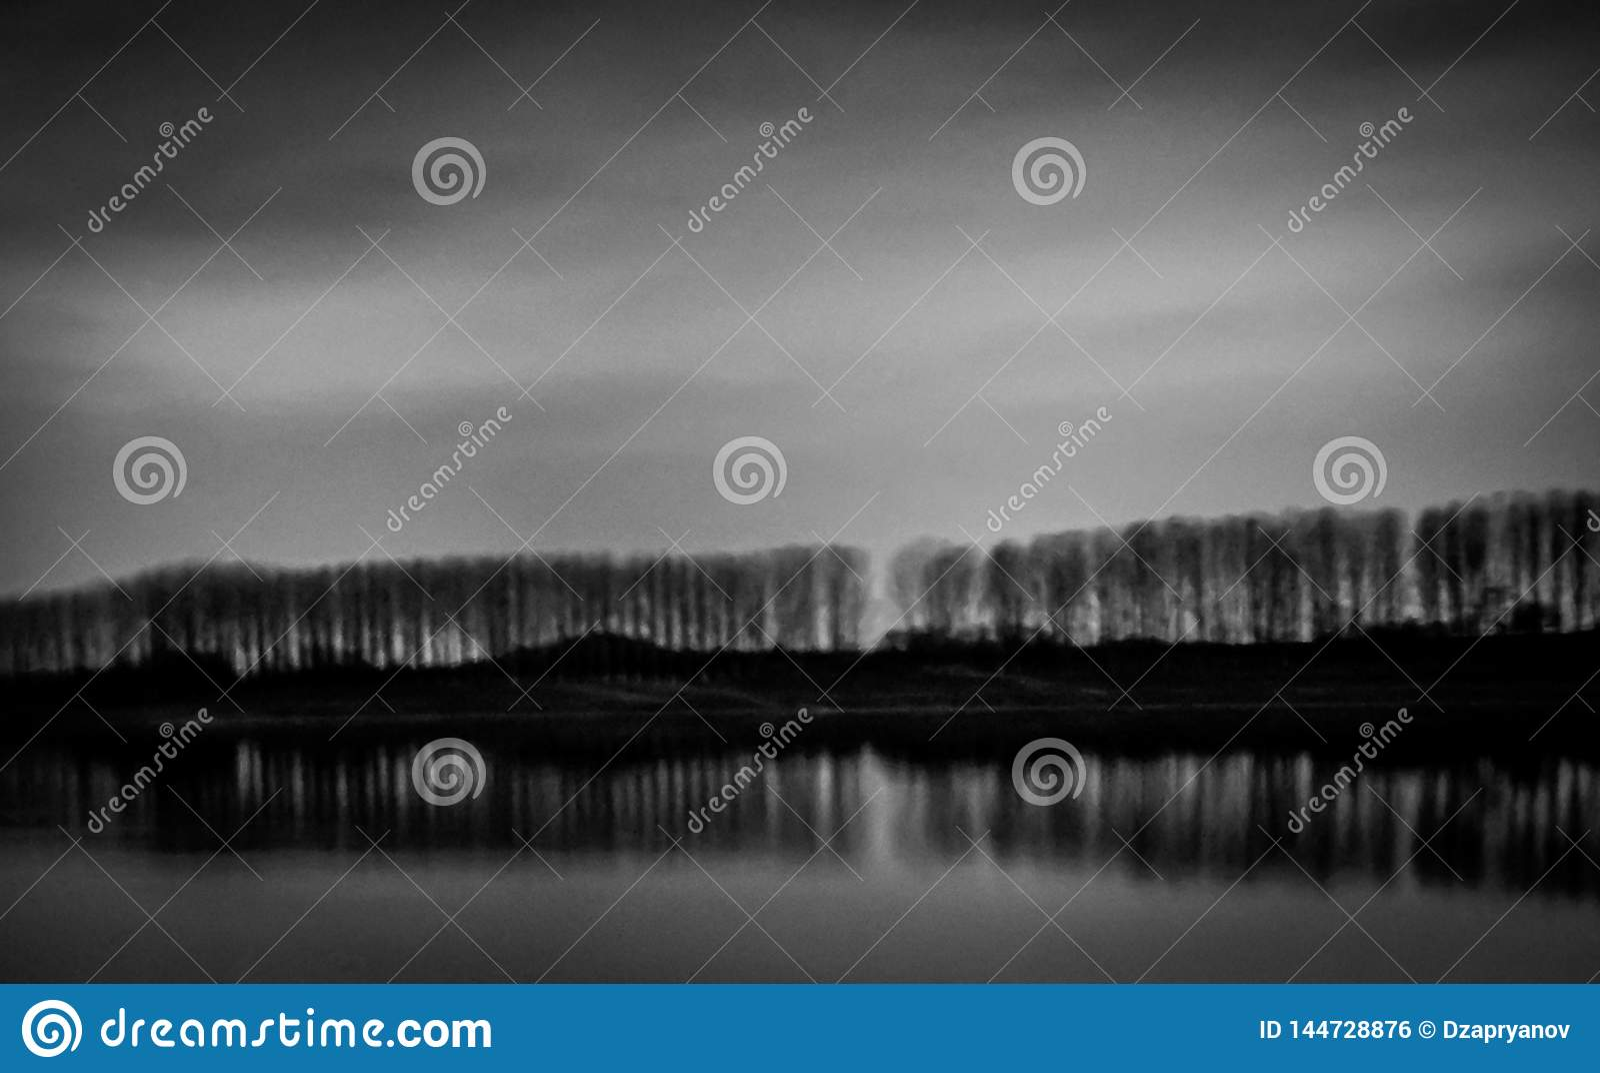 Kazanlak Bulgarien, Koprinka fördämning, nattfotografi